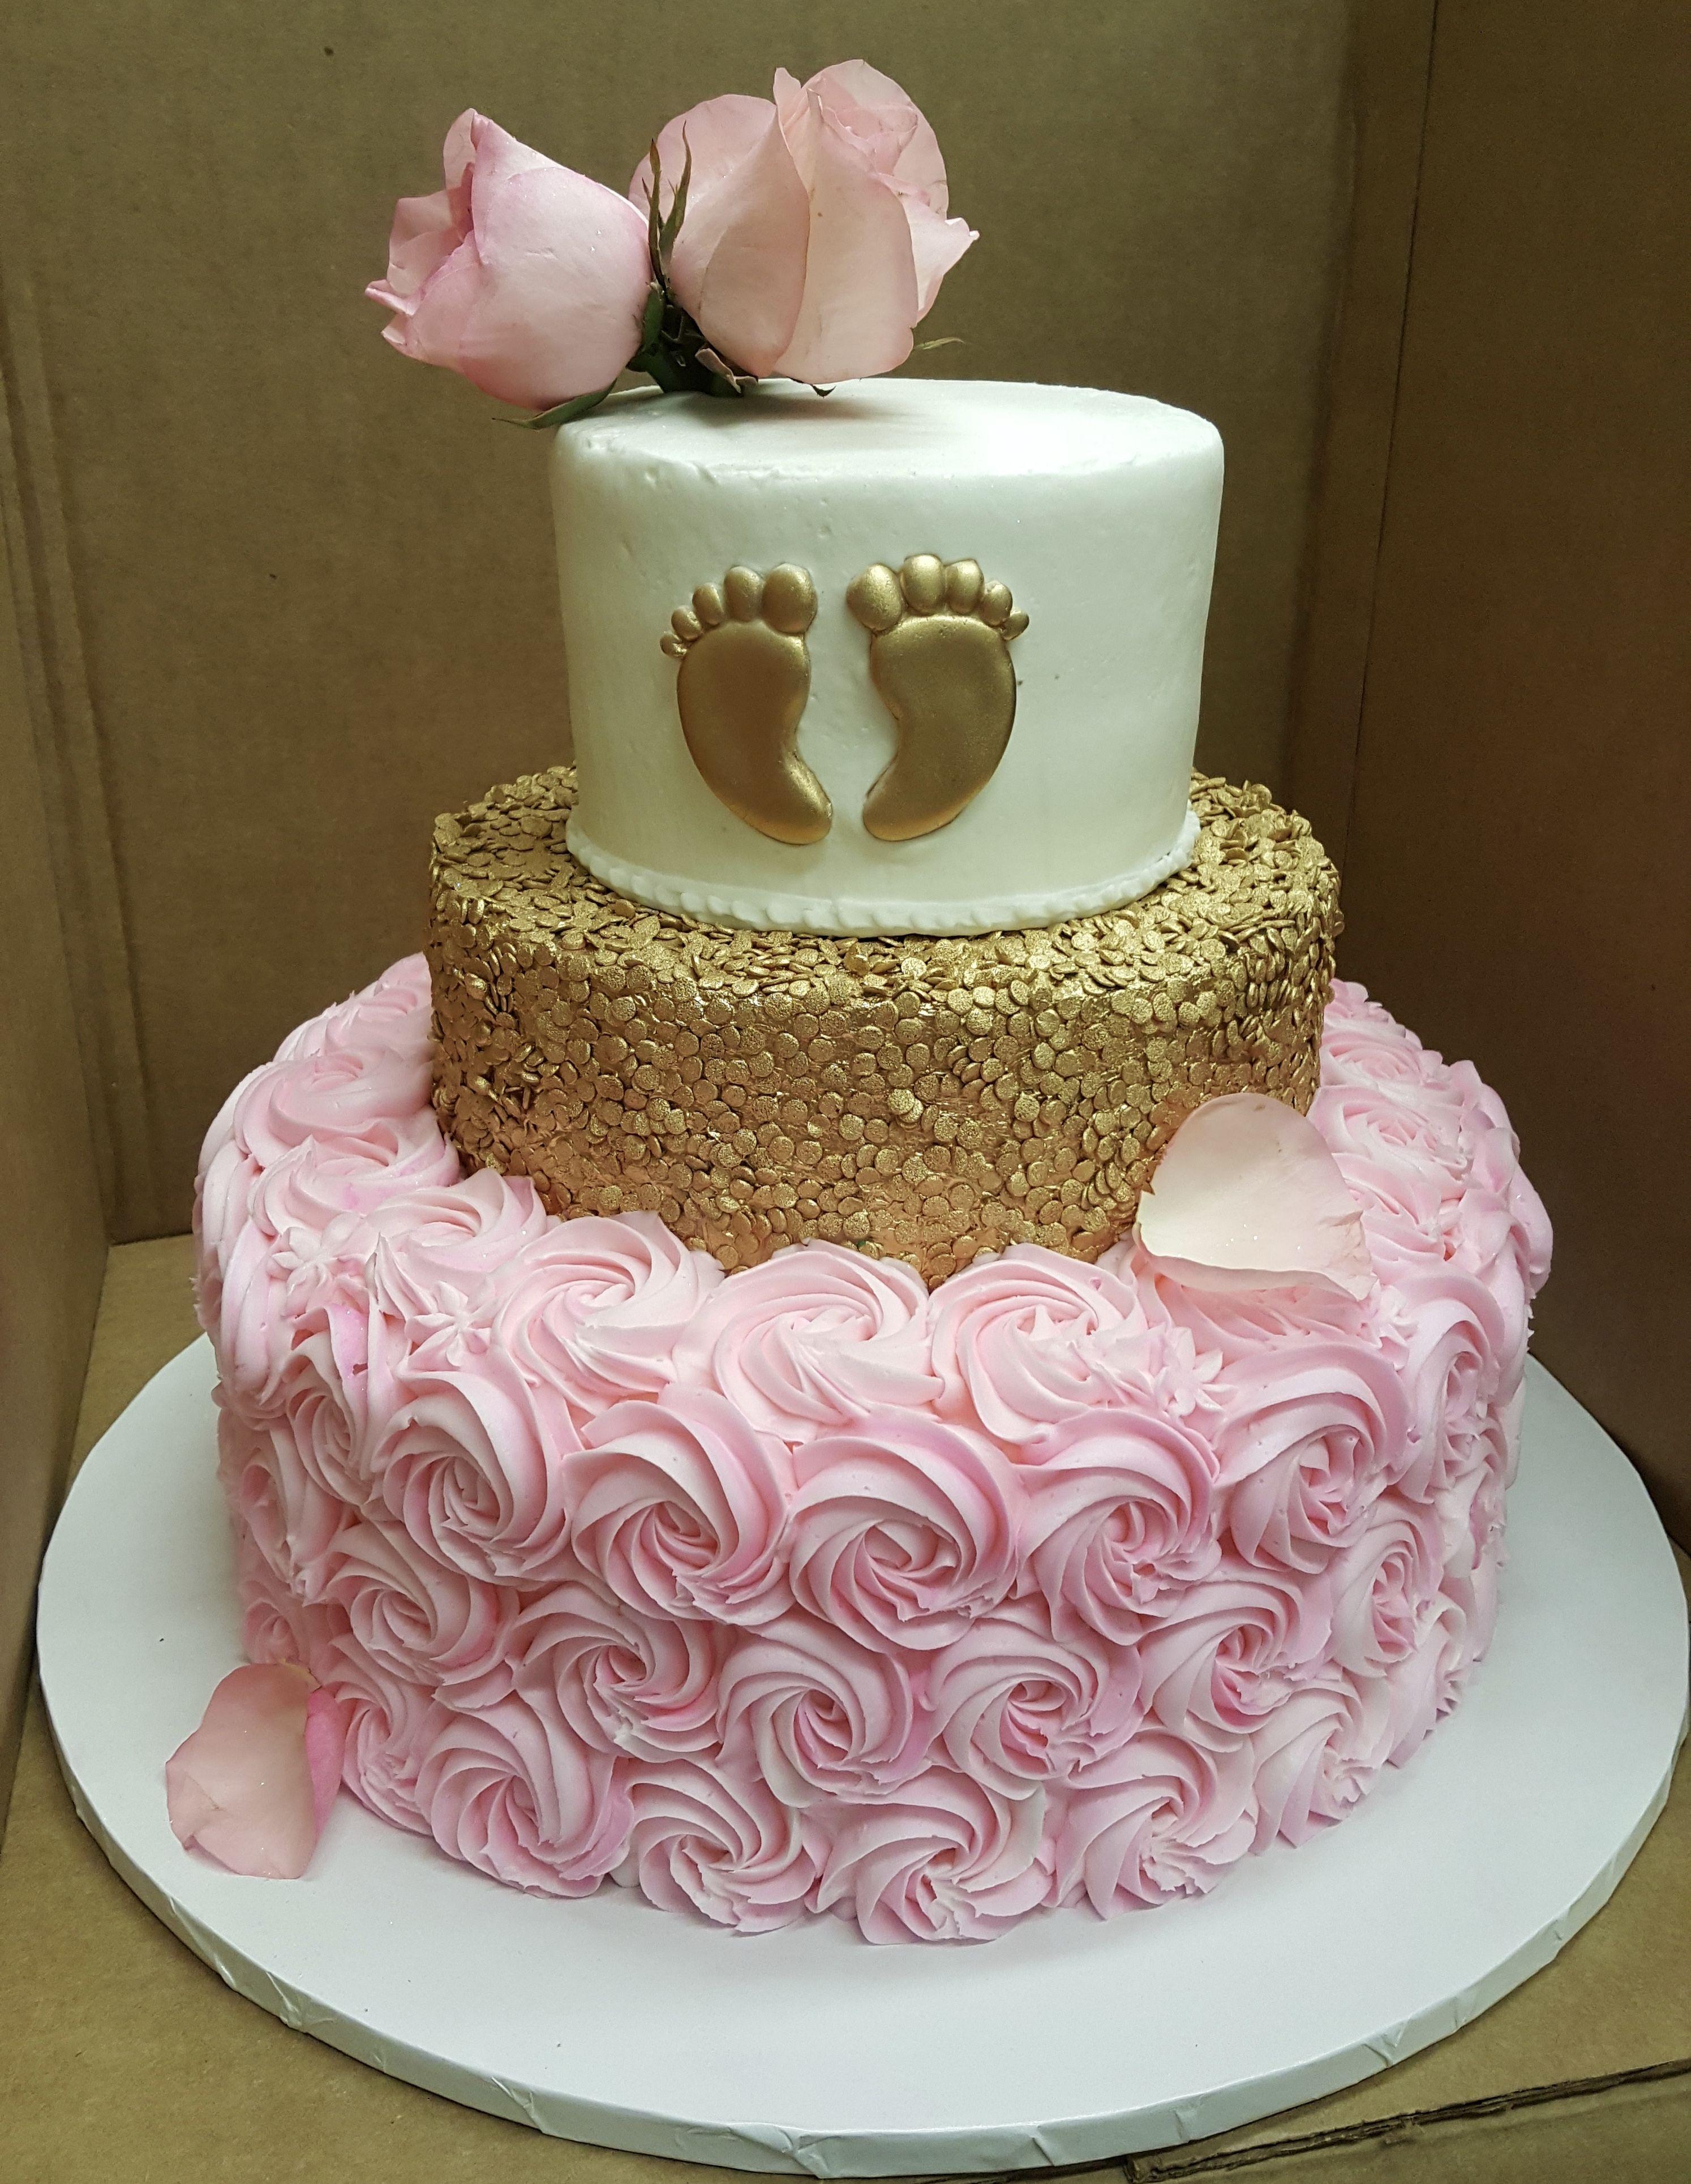 Calumet Bakery Three tier Baby Feet/gold/rosettes